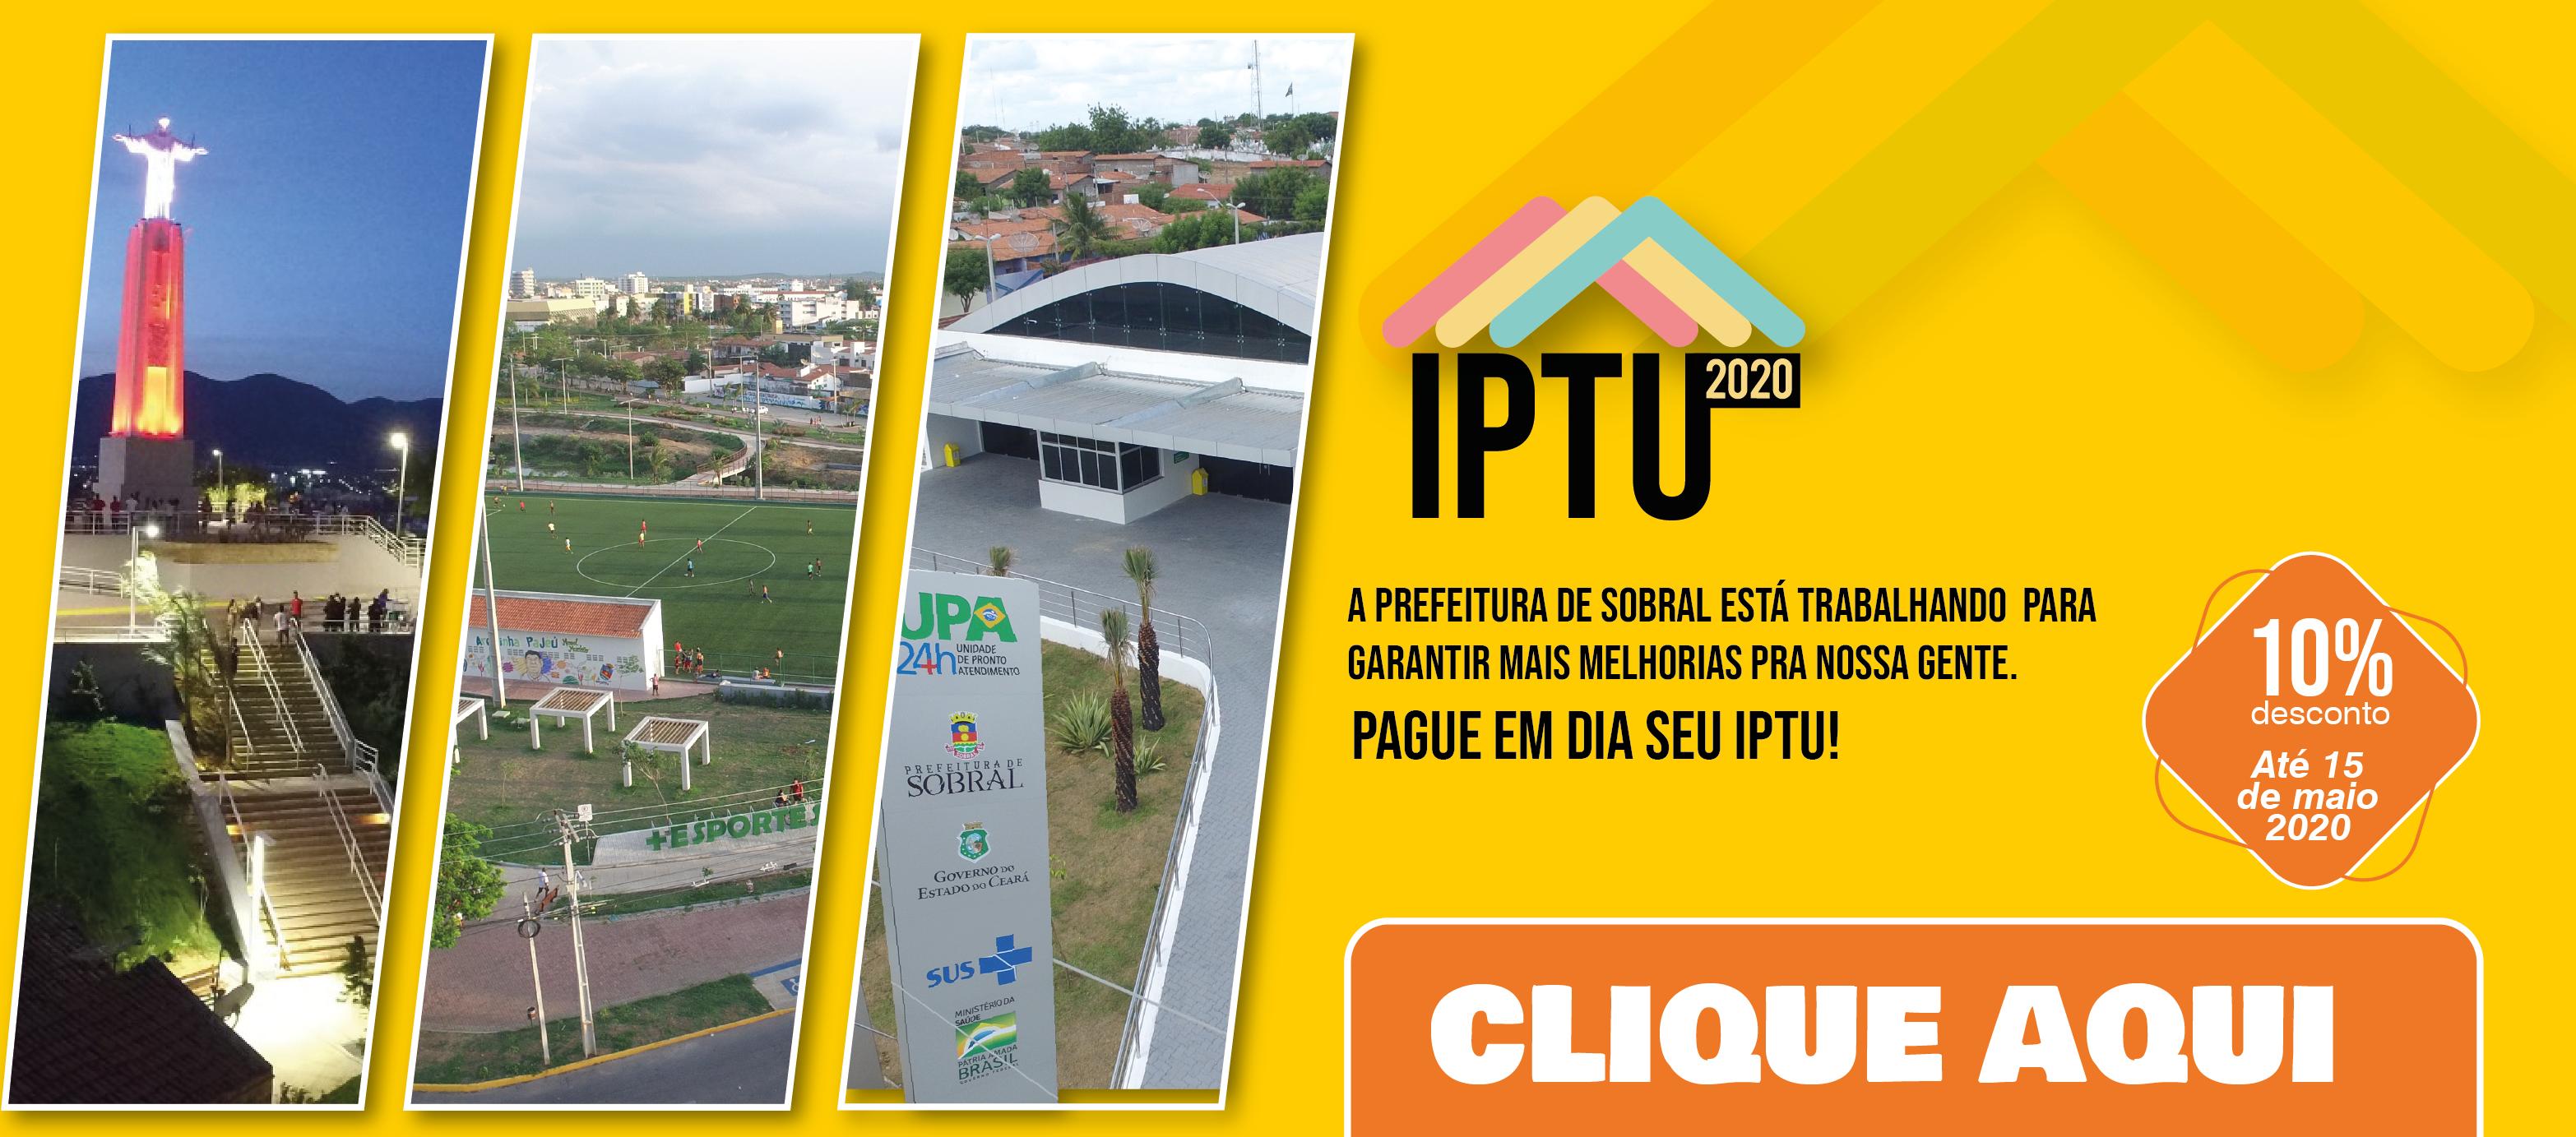 IPTU 2020 - BOTAO SITE-03.png